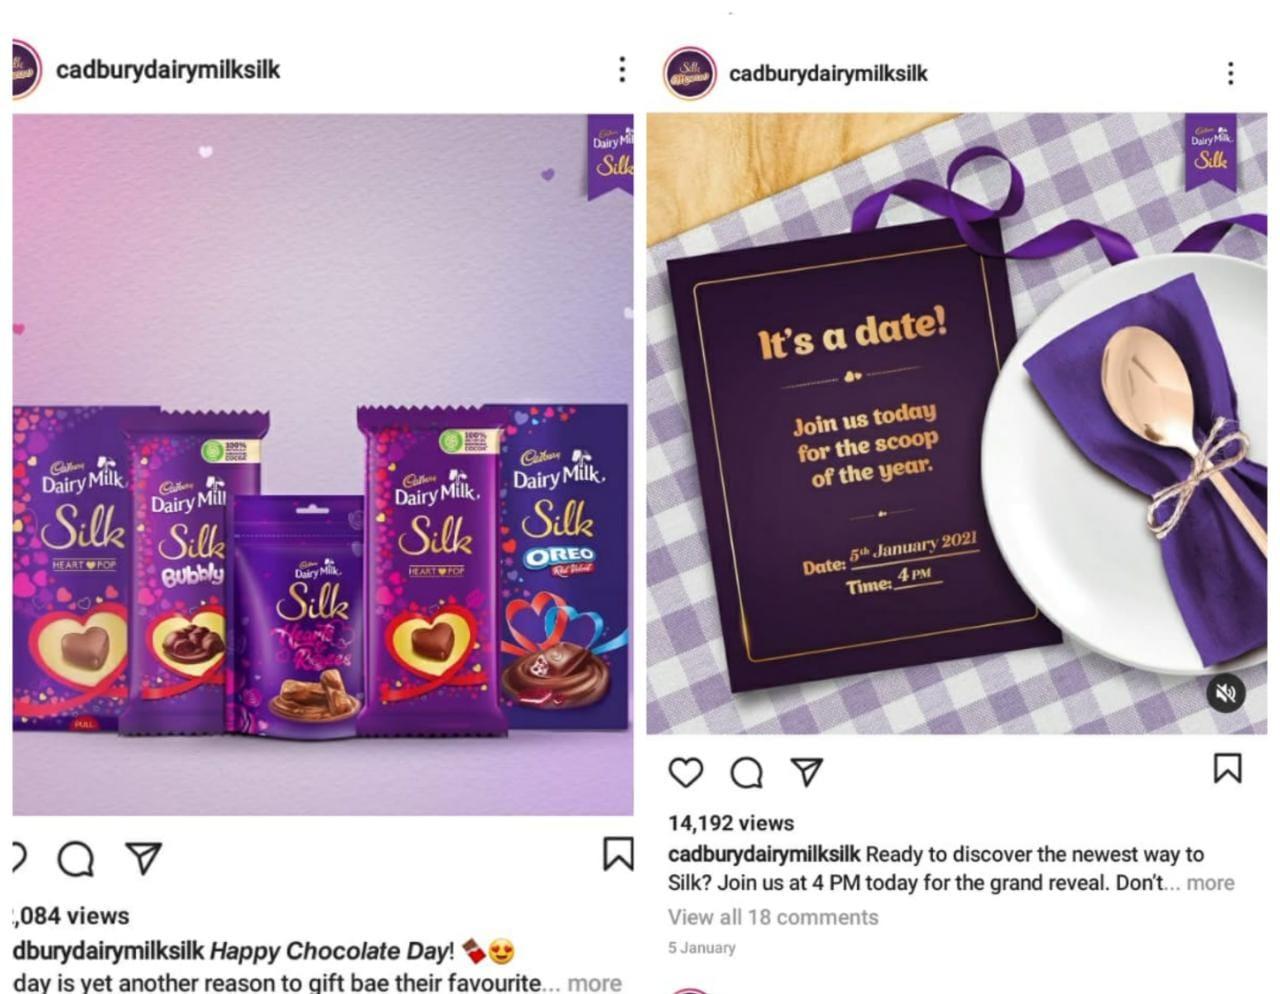 Cadbury Dairy Milk Silk using social media marketing